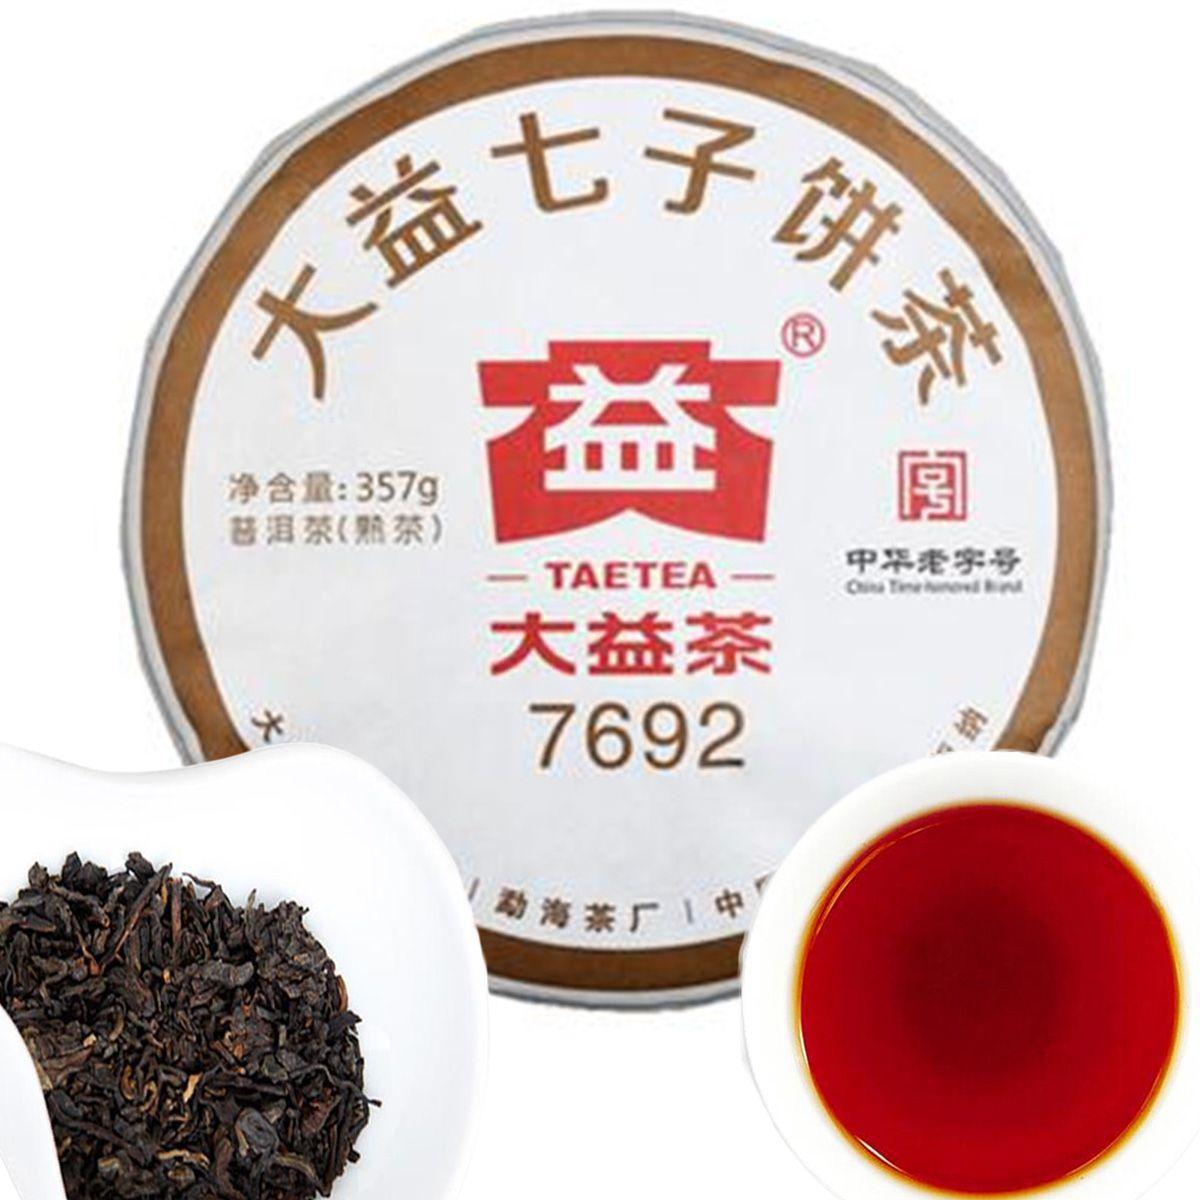 Té chino del puer 357g árboles maduros Puer Té Negro Dayi Qizi erh torta de Puerh cocido Health Care Puer saludable Green Good